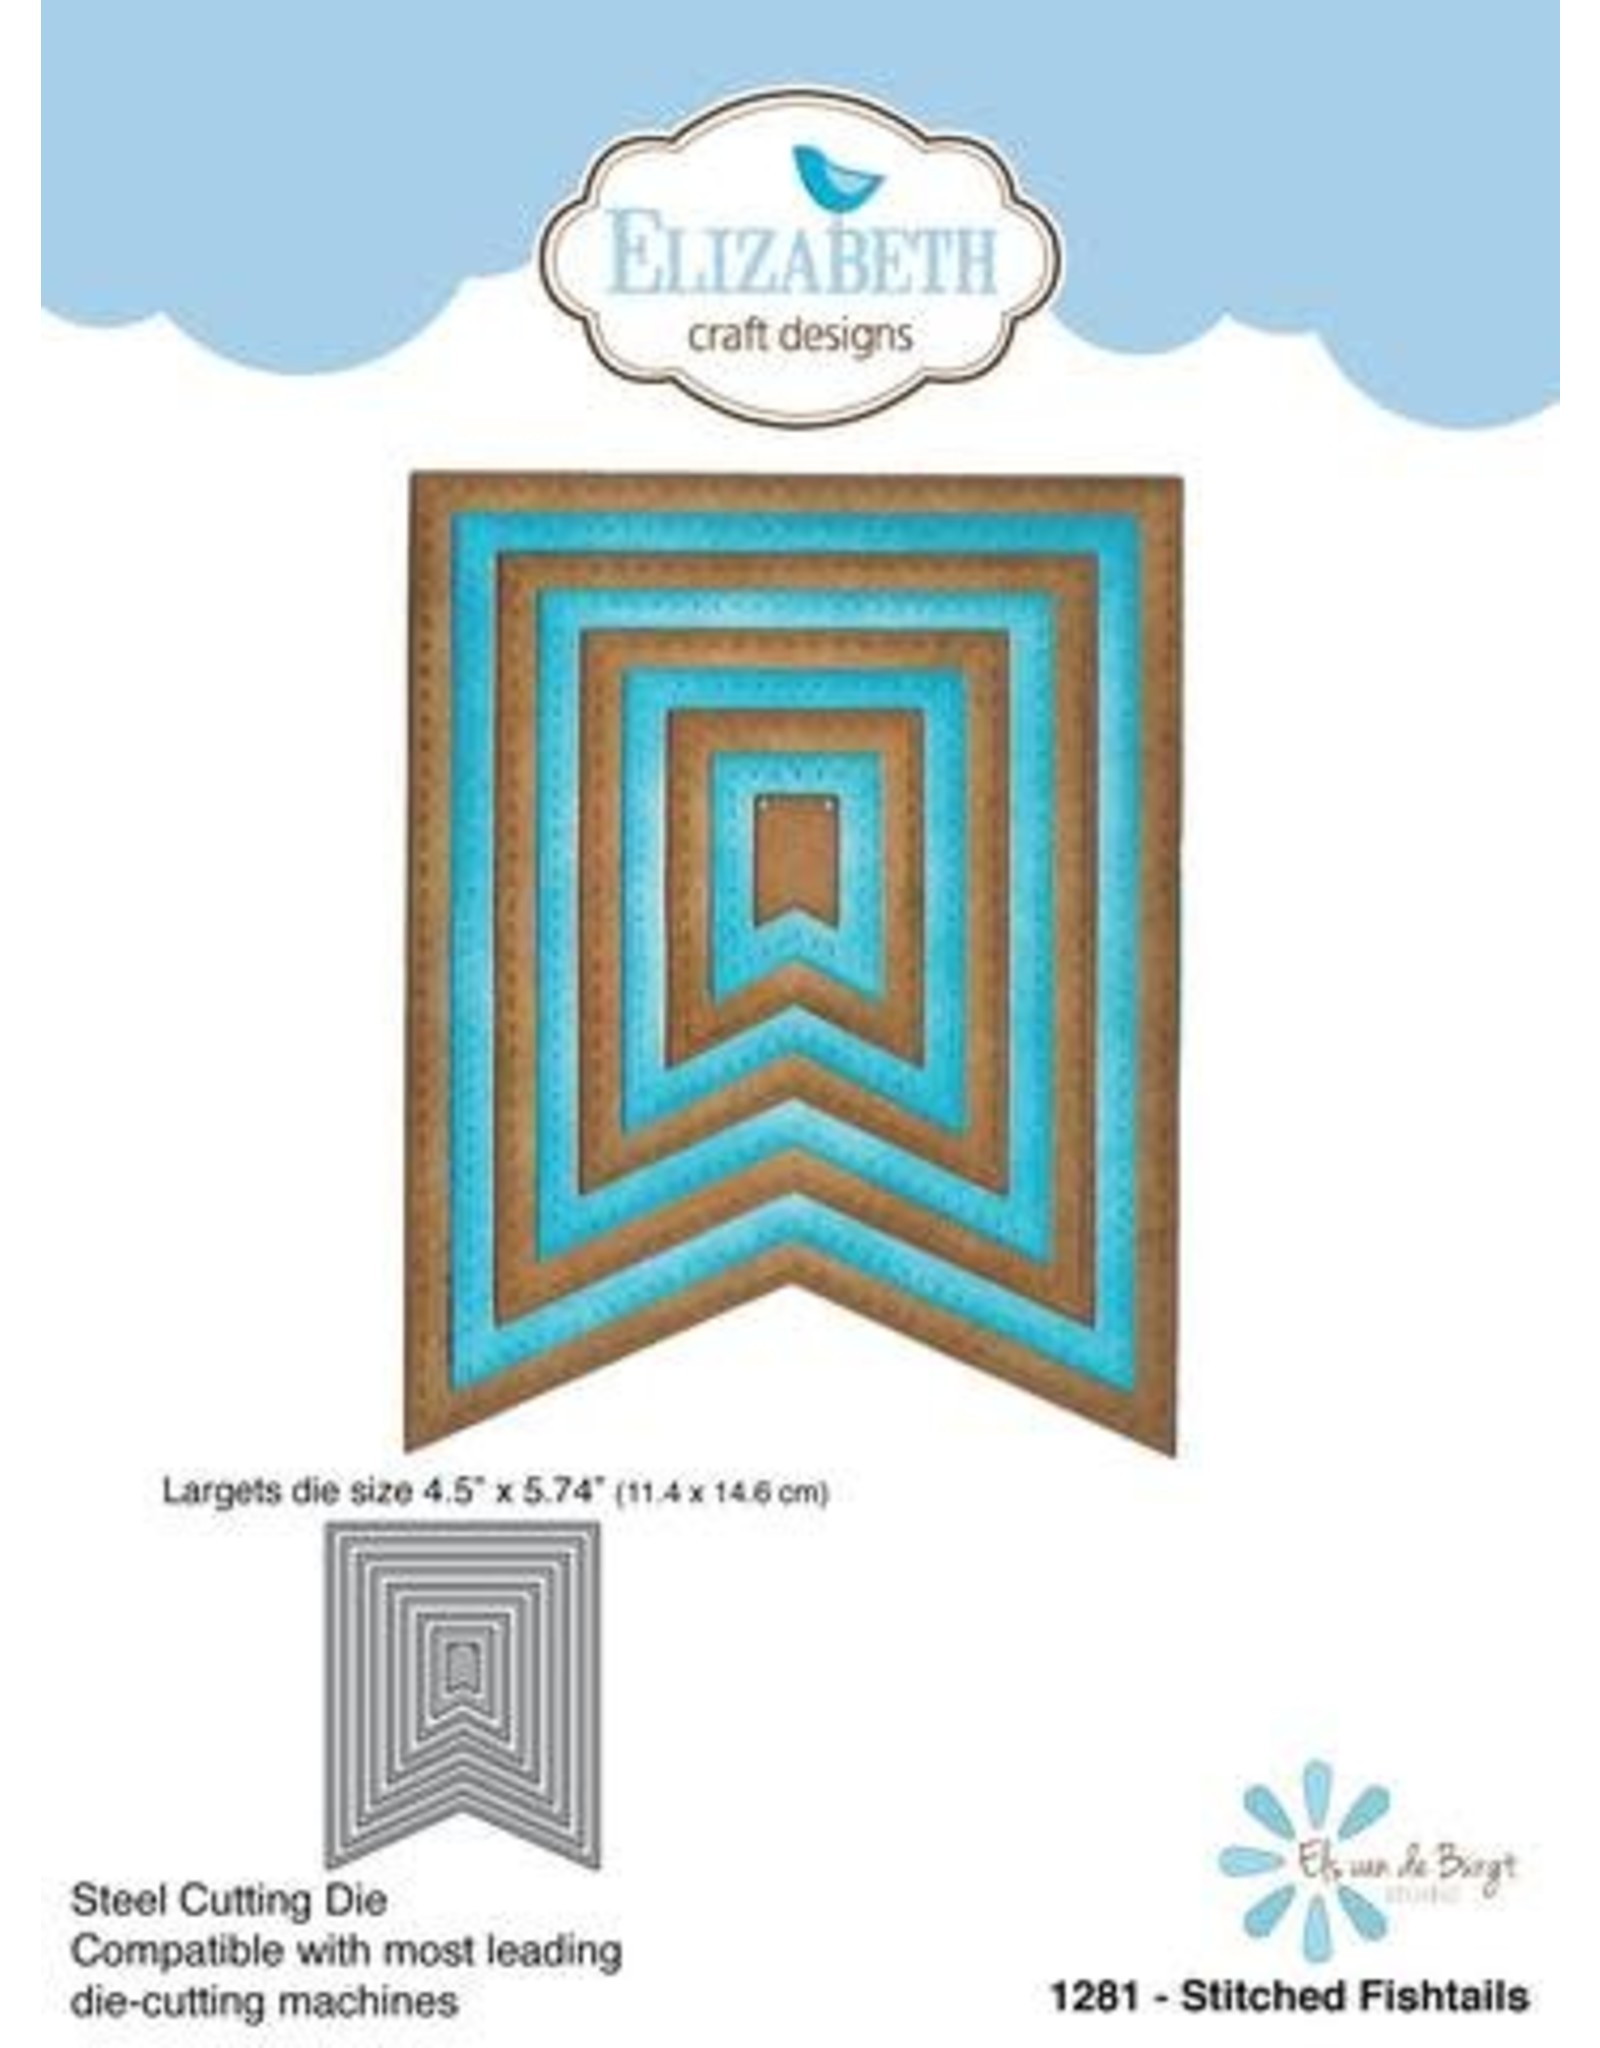 Elizabeth Craft Designs Elizabeth Craft Designs dies Stitched Fishtails 1281